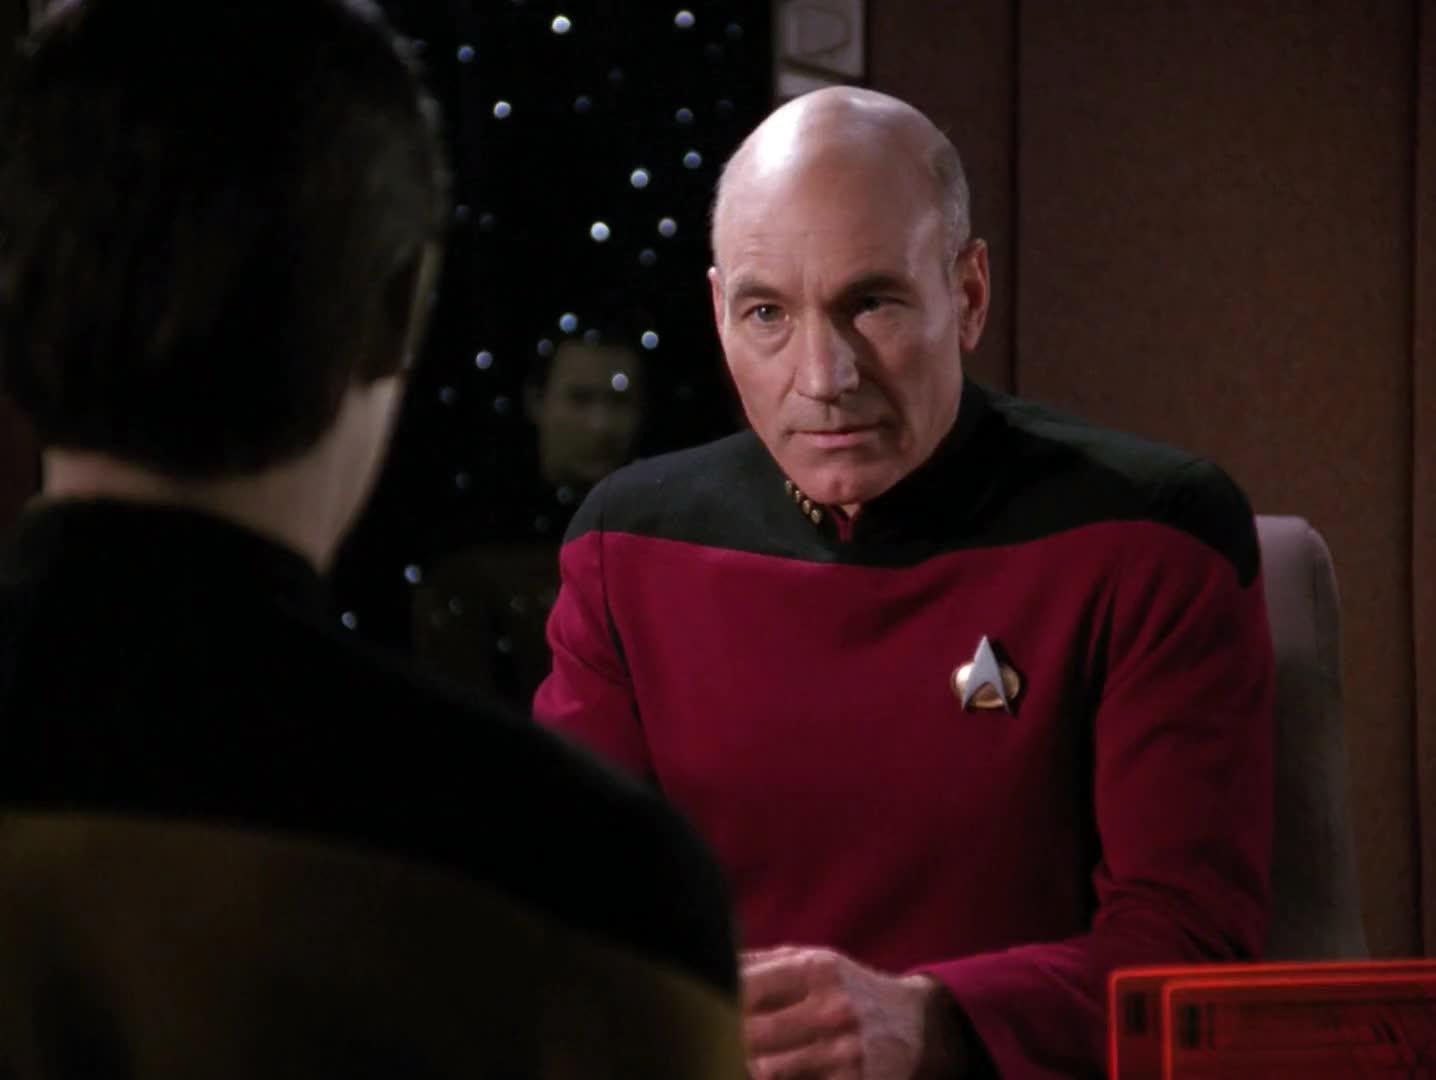 double, facepalm, picard, Picard Double Facepalm GIFs